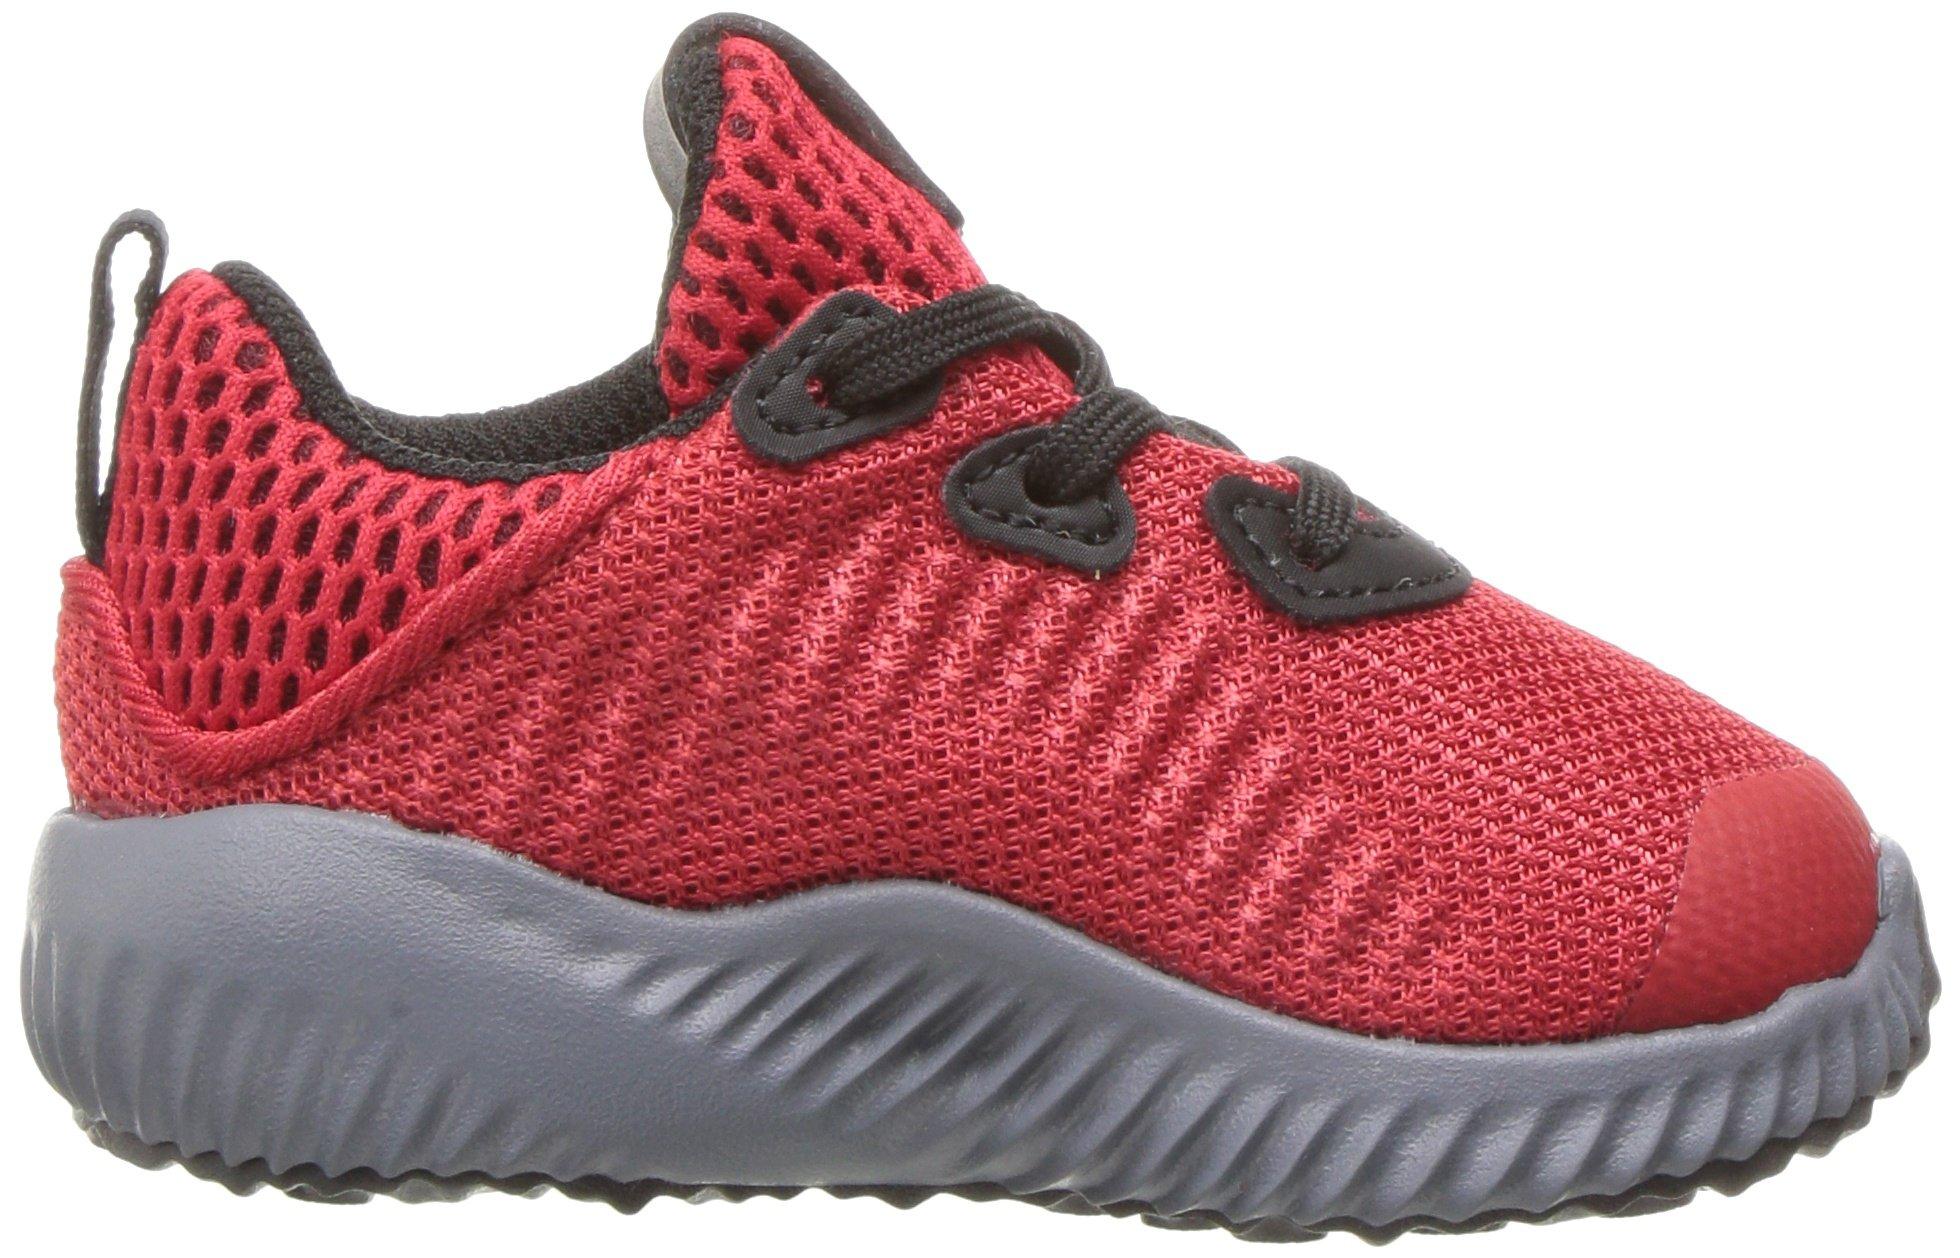 adidas Kids' Alphabounce Sneaker, Scarlet/Satellite/Black, 8 M US Toddler by adidas (Image #7)